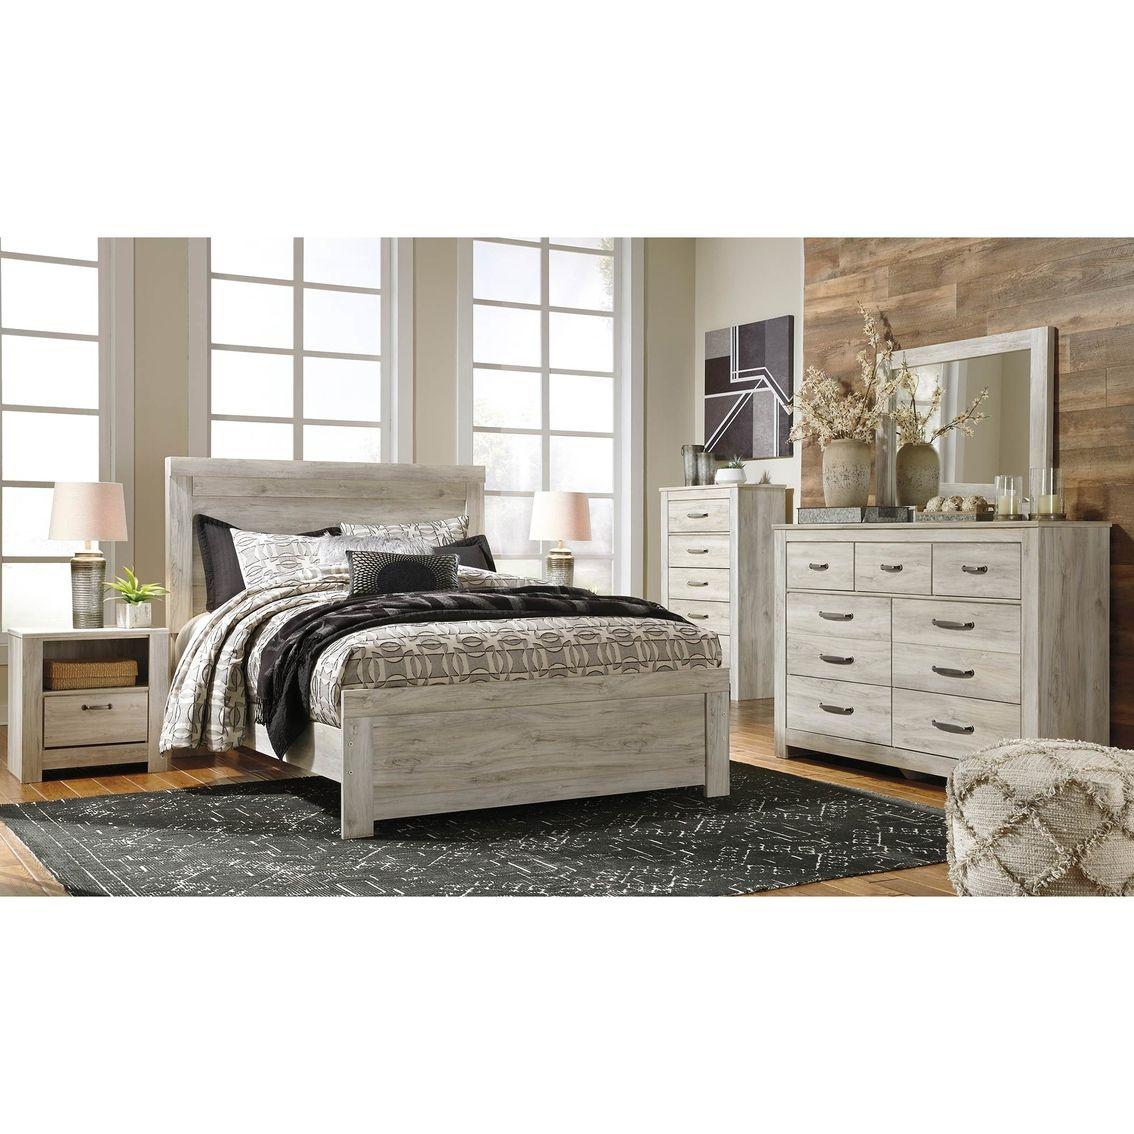 Signature Design By Ashley Bellaby 5 Pc Panel Bed Set Bedroom Sets Home Appliances Shop The Exchange Furniture Bedroom Set Queen Panel Beds